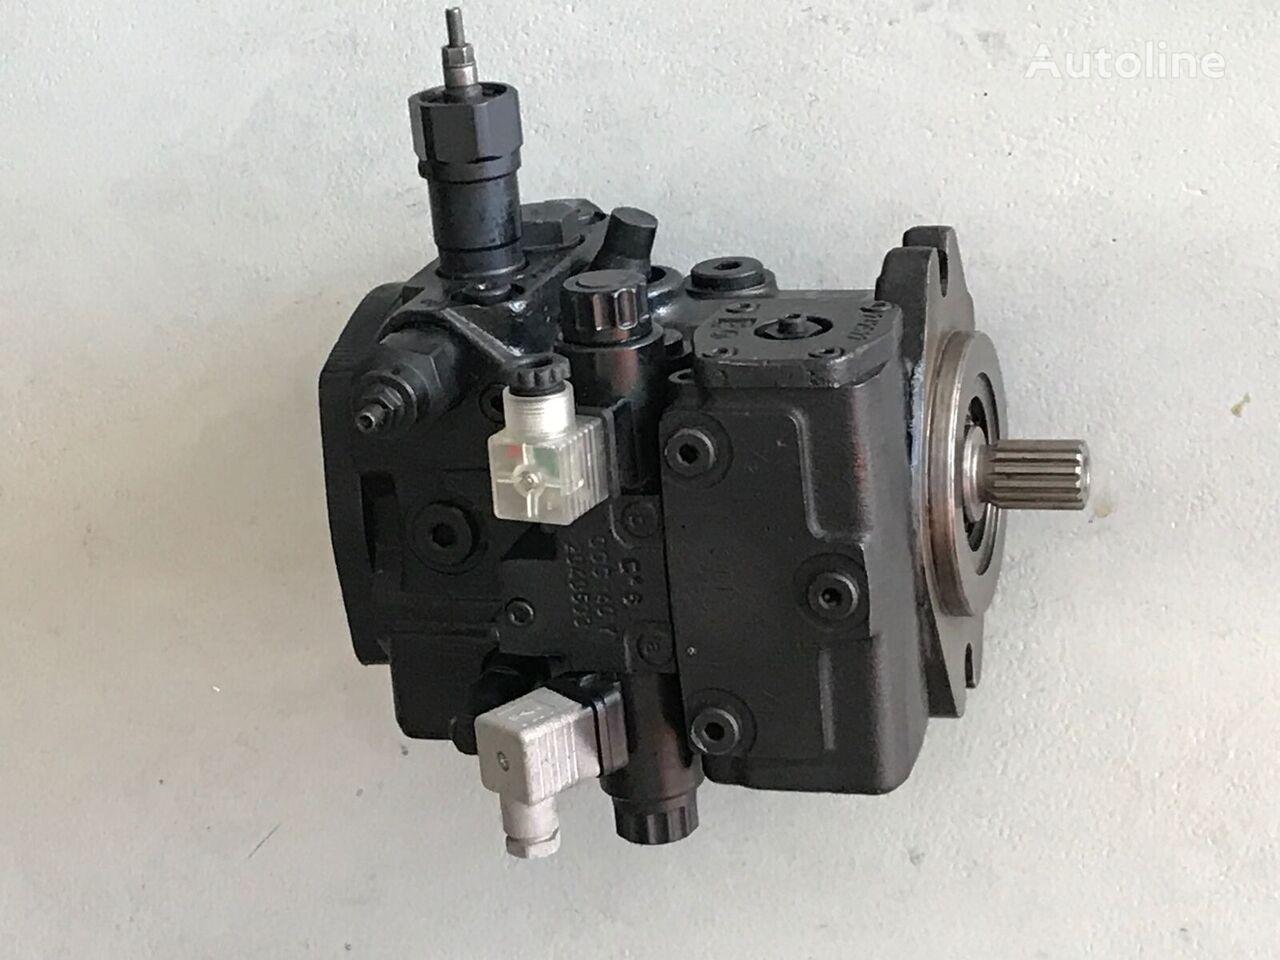 Rexroth A10VG28-PALAZZANI hydraulic pump for DIECI  Merlo, Manitou wheel loader